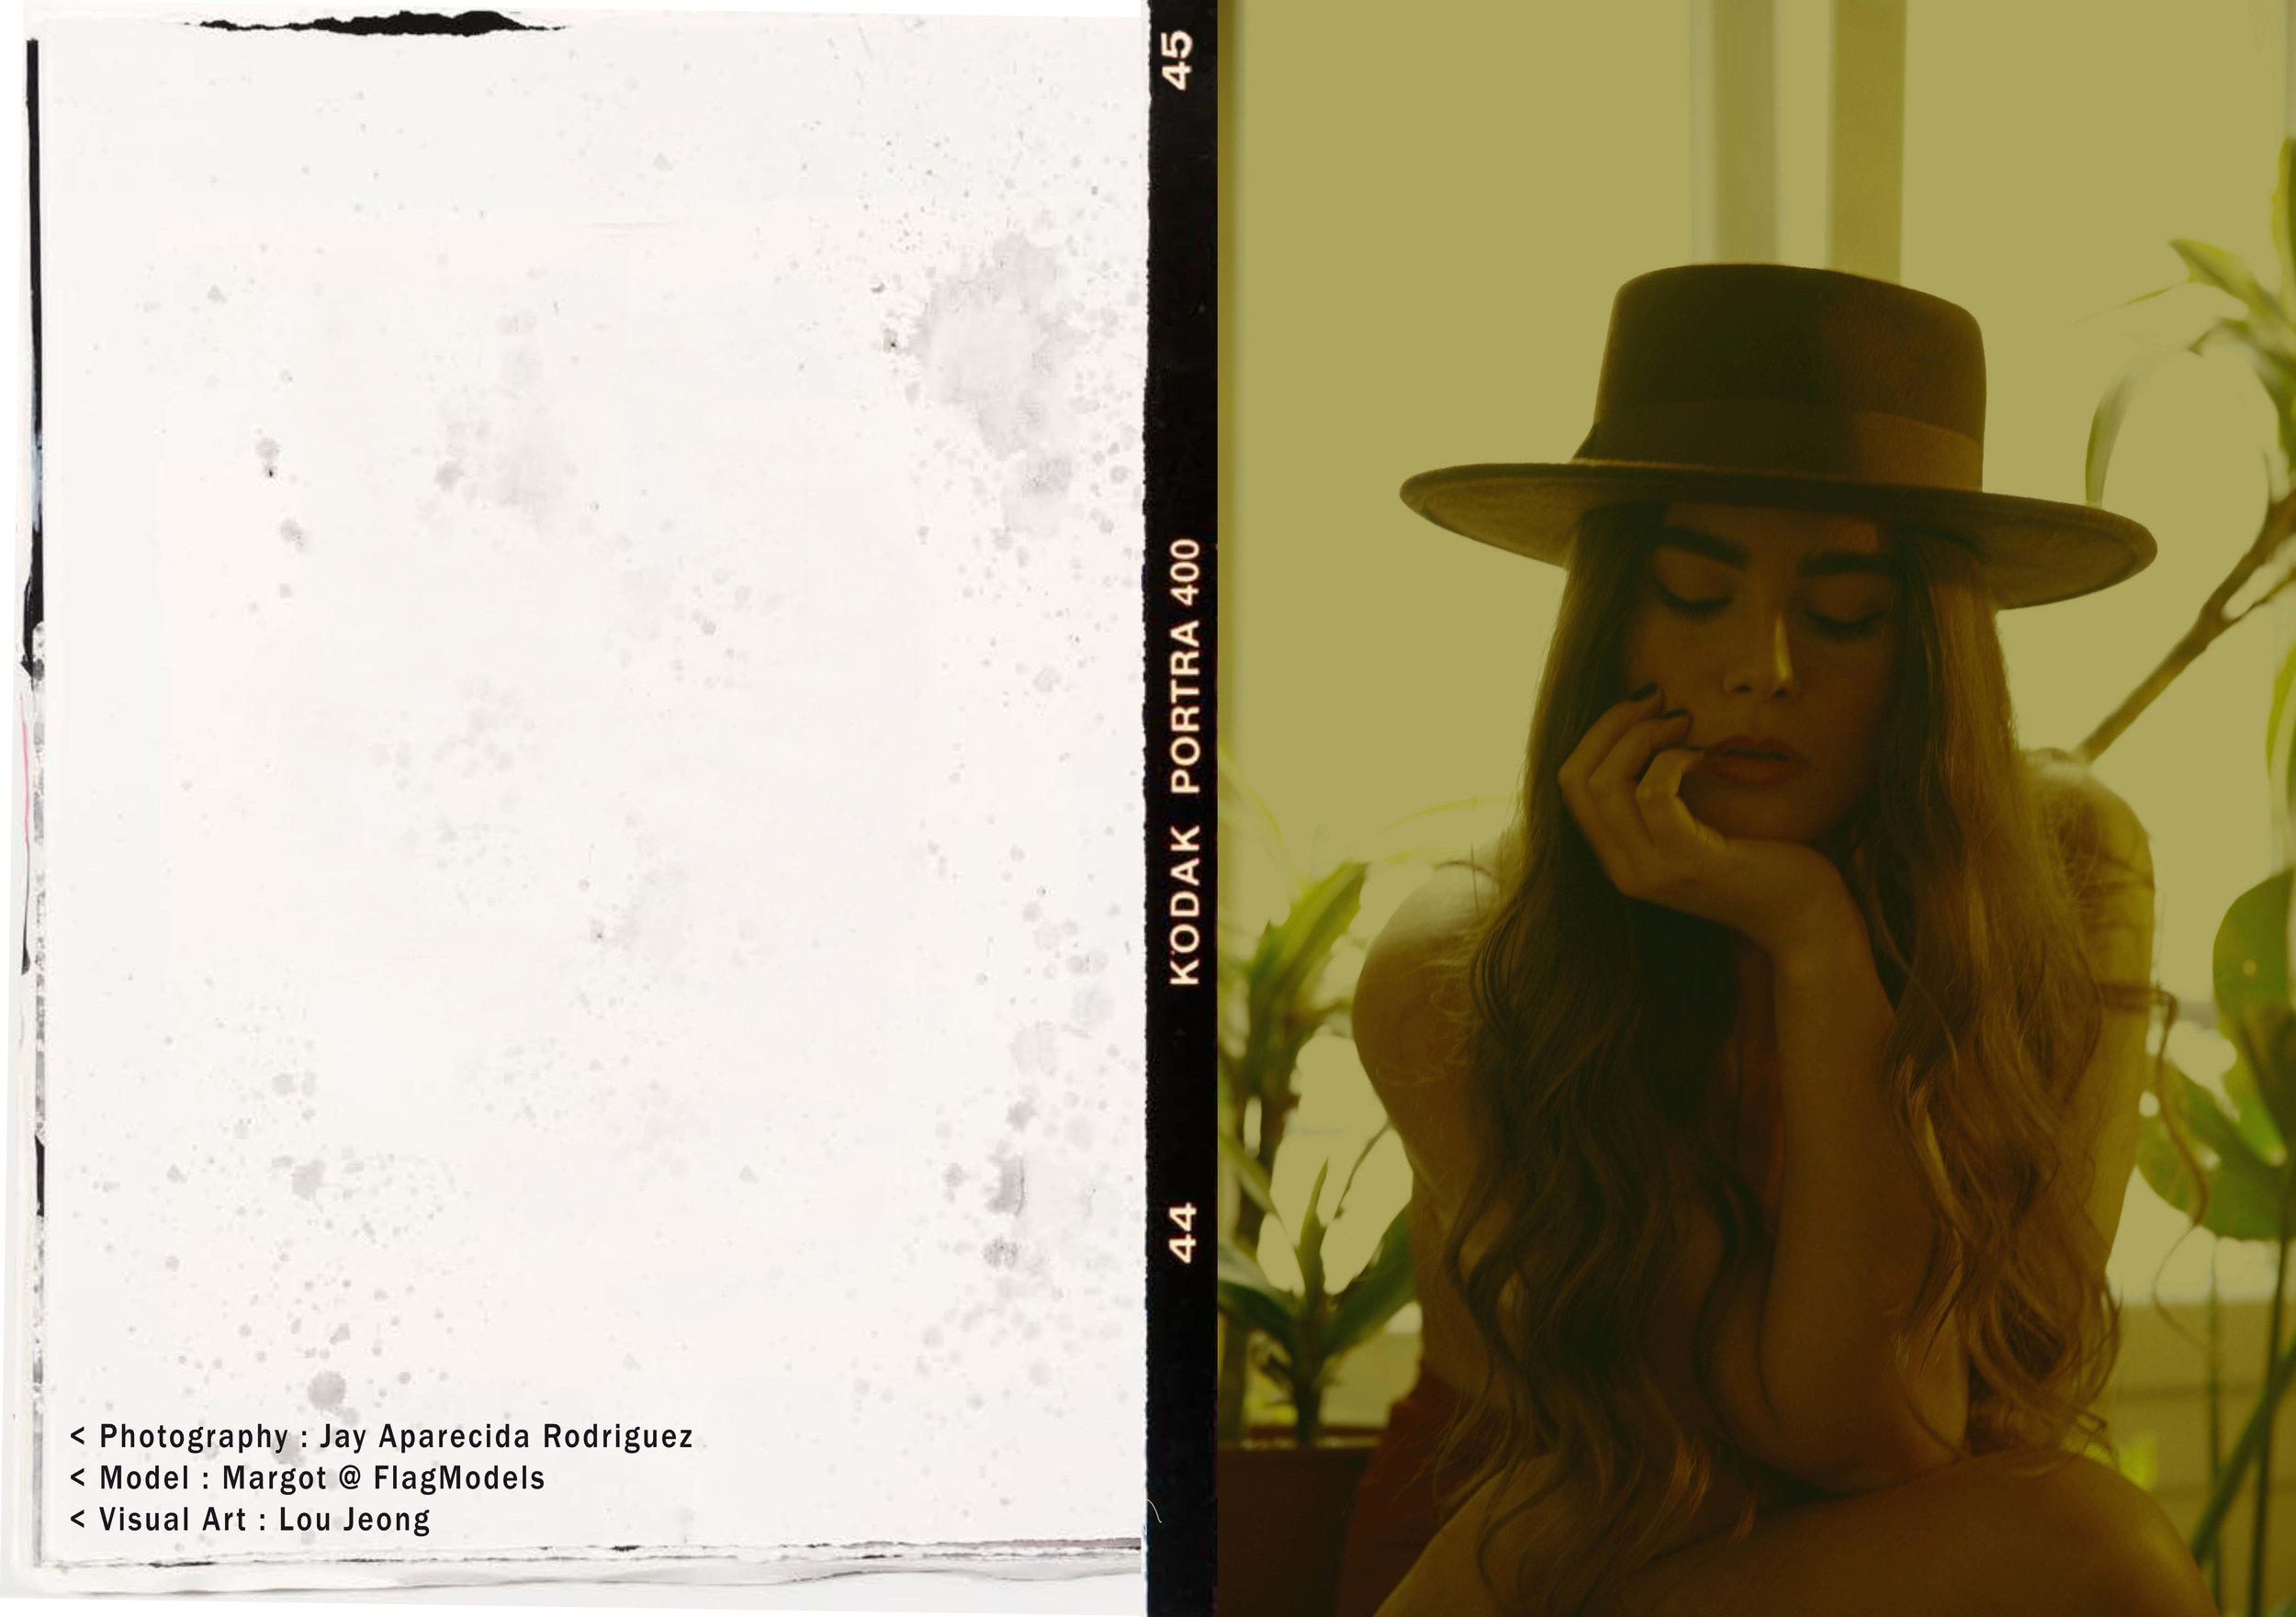 Margot by Jay Aparecida Rodriguez